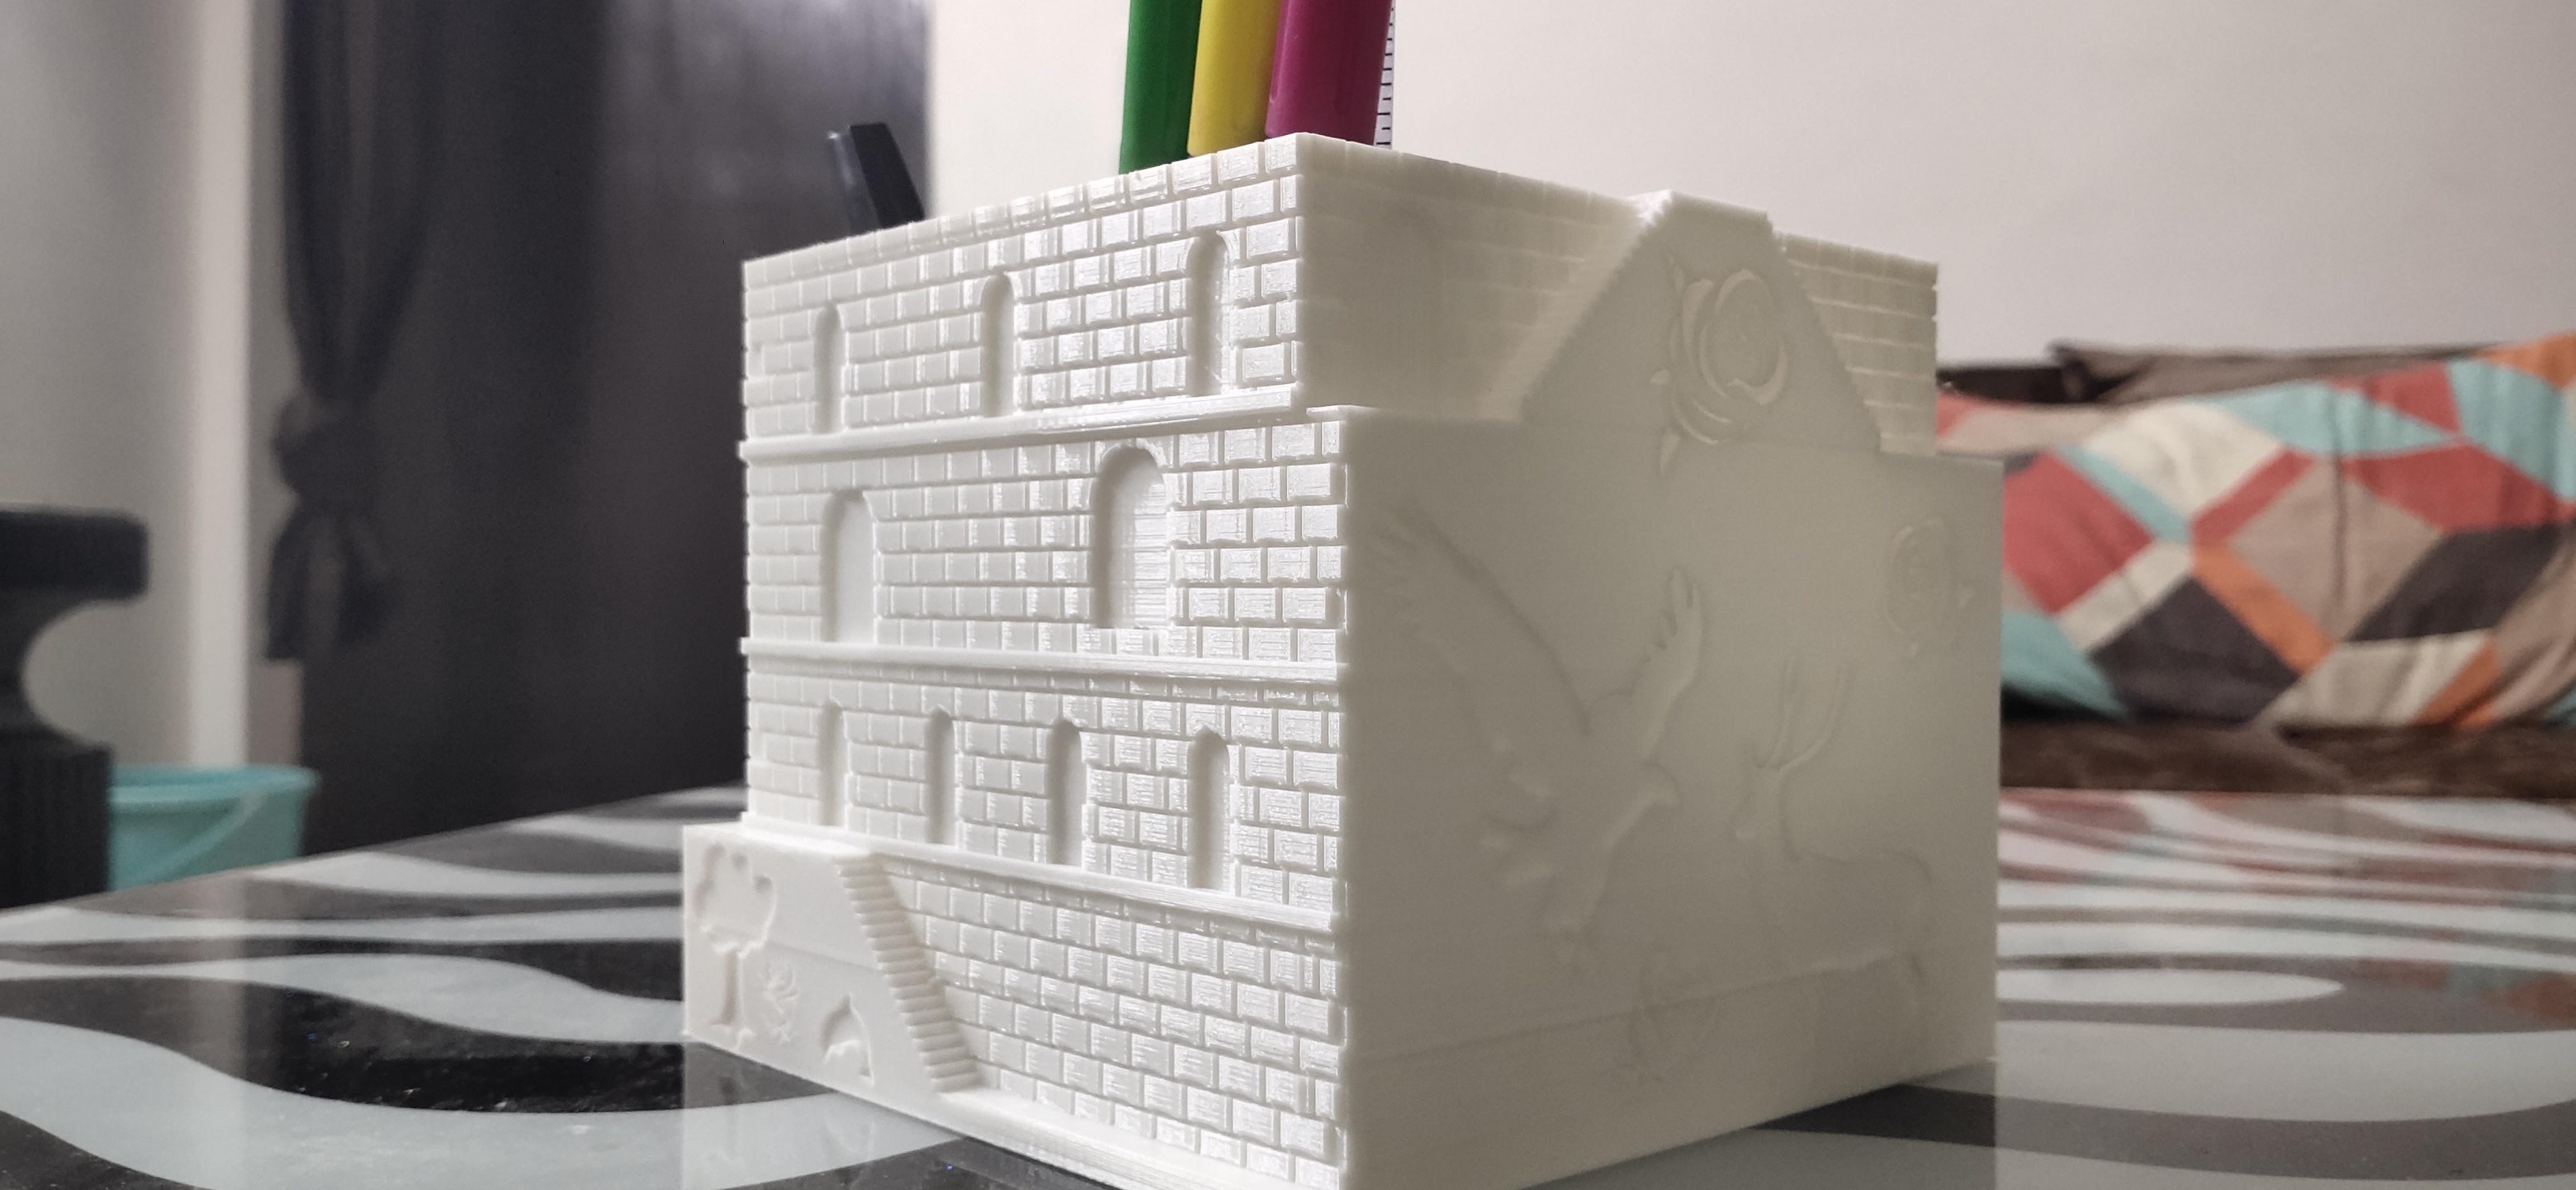 IMG_20200928_160311.jpg Download STL file Plant and desk pot • 3D printer object, FutureDesigns